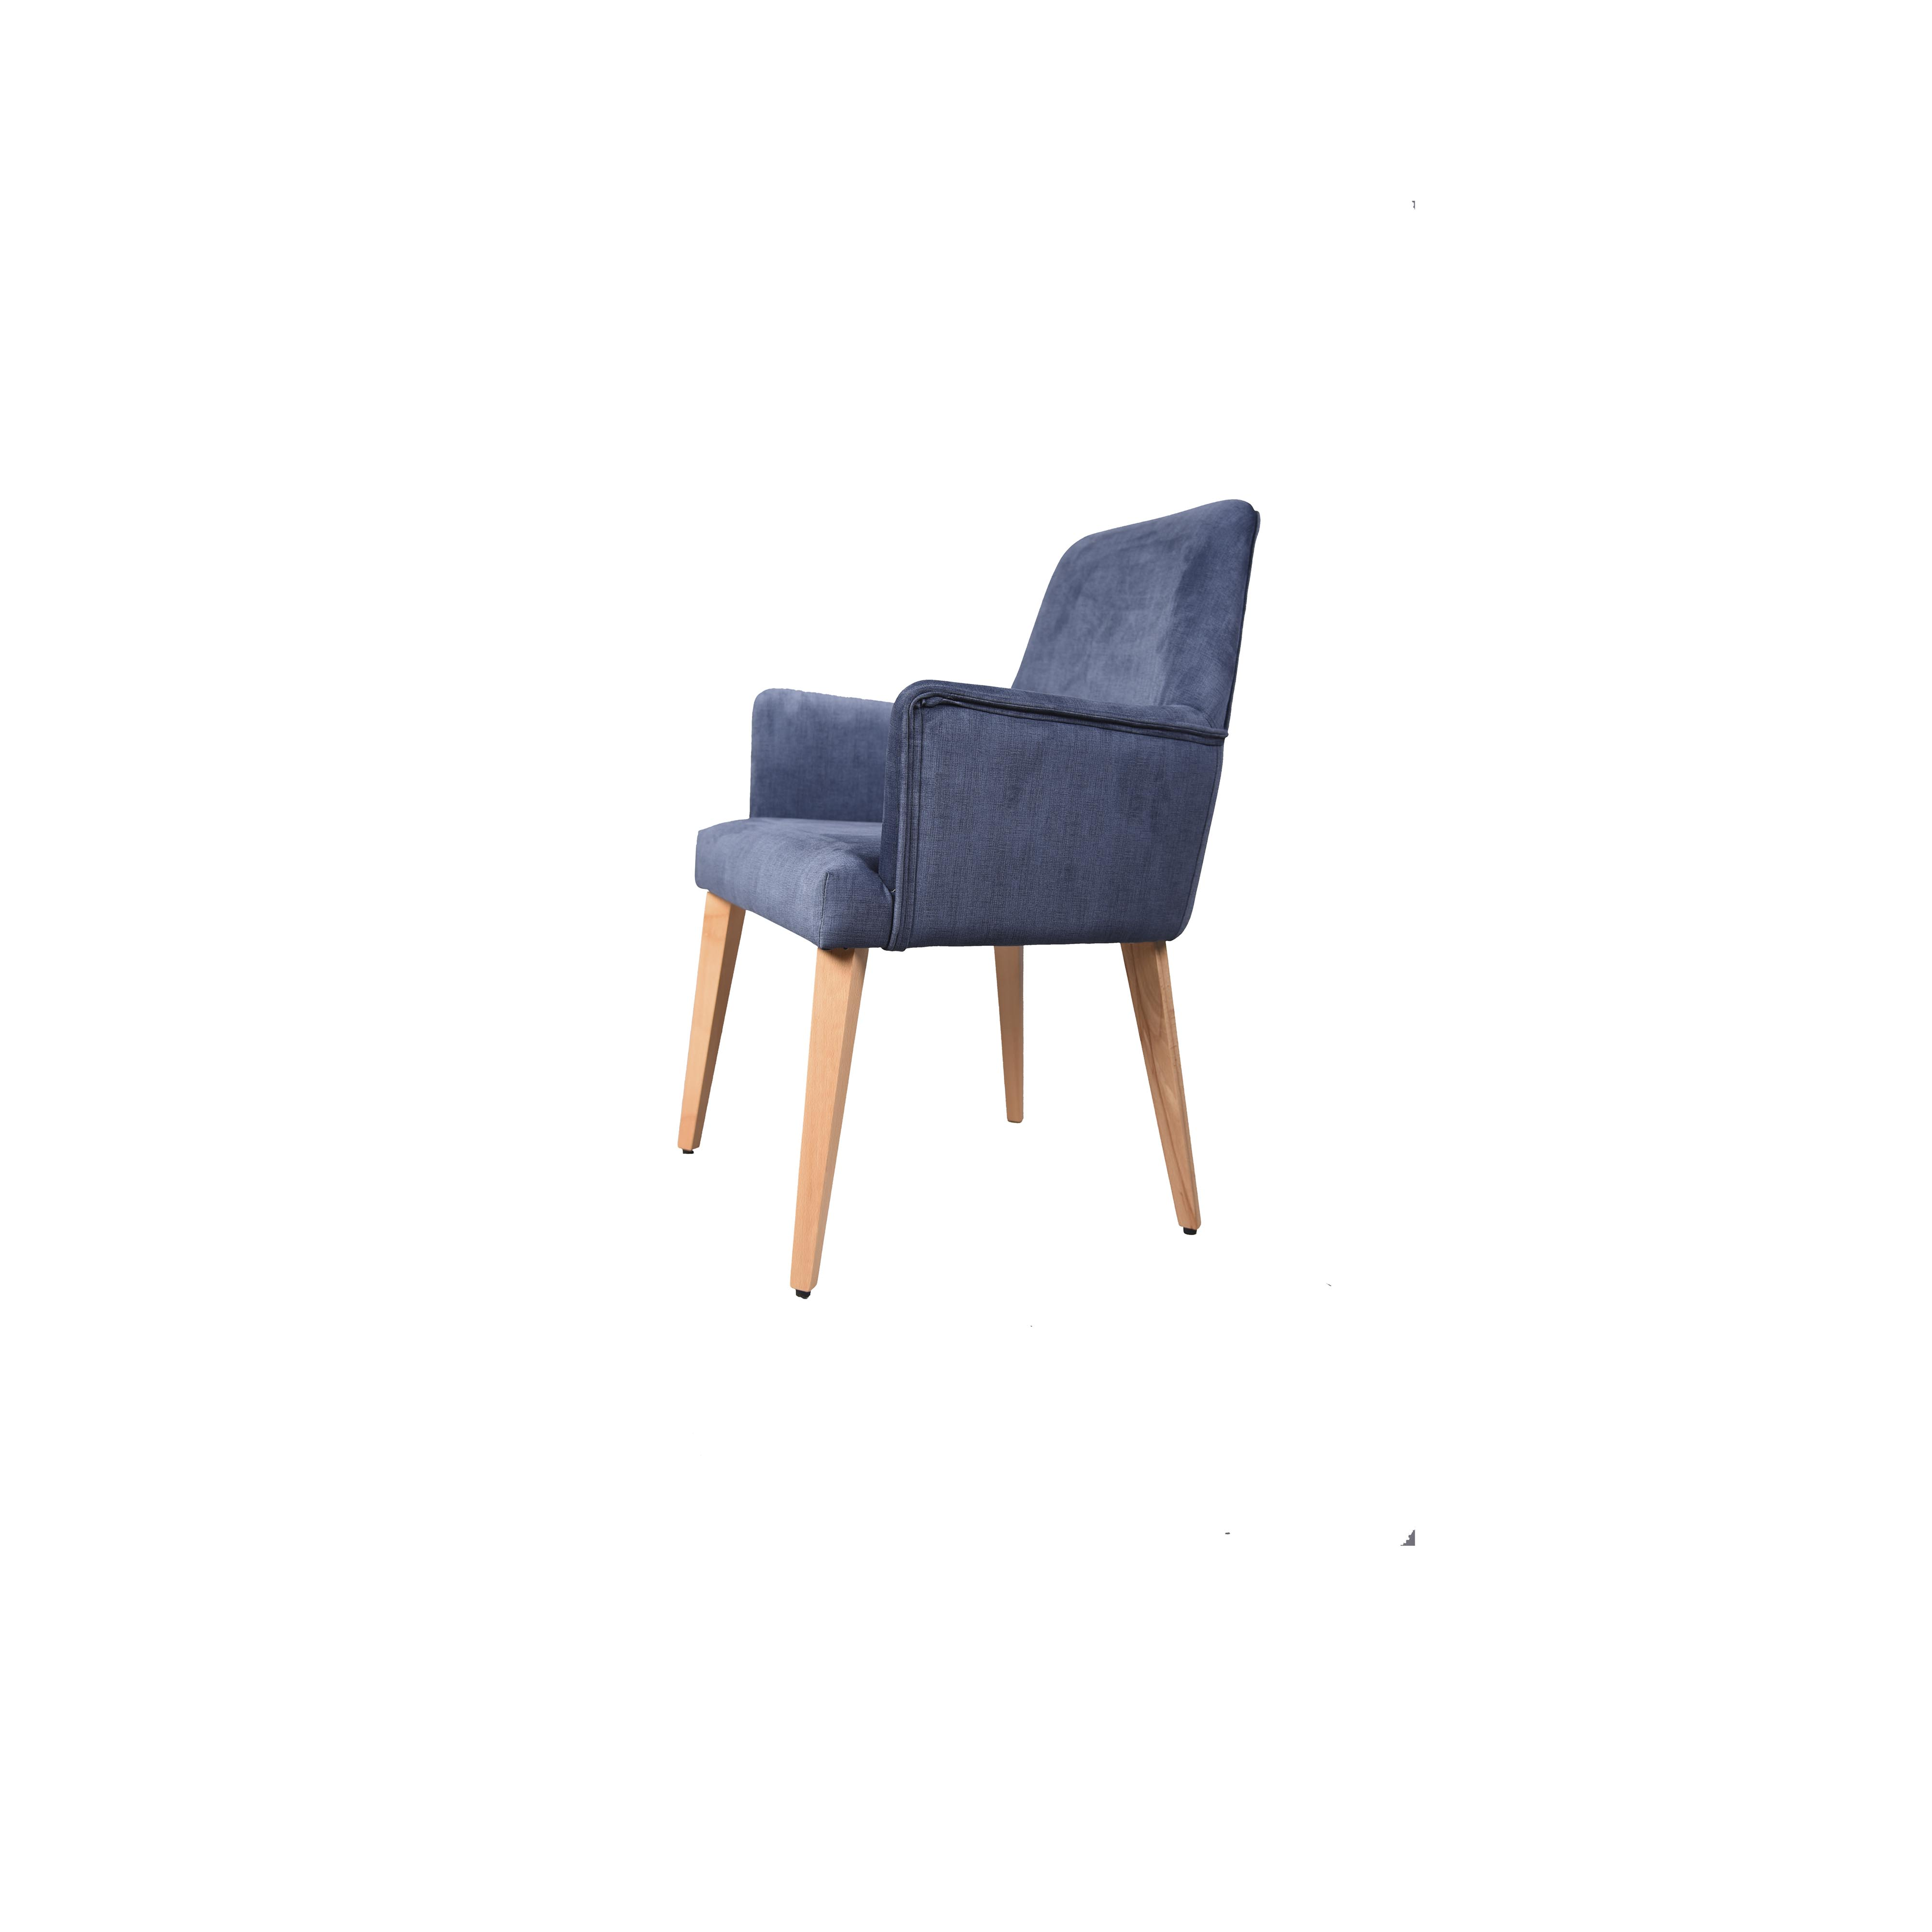 Linna dining chair